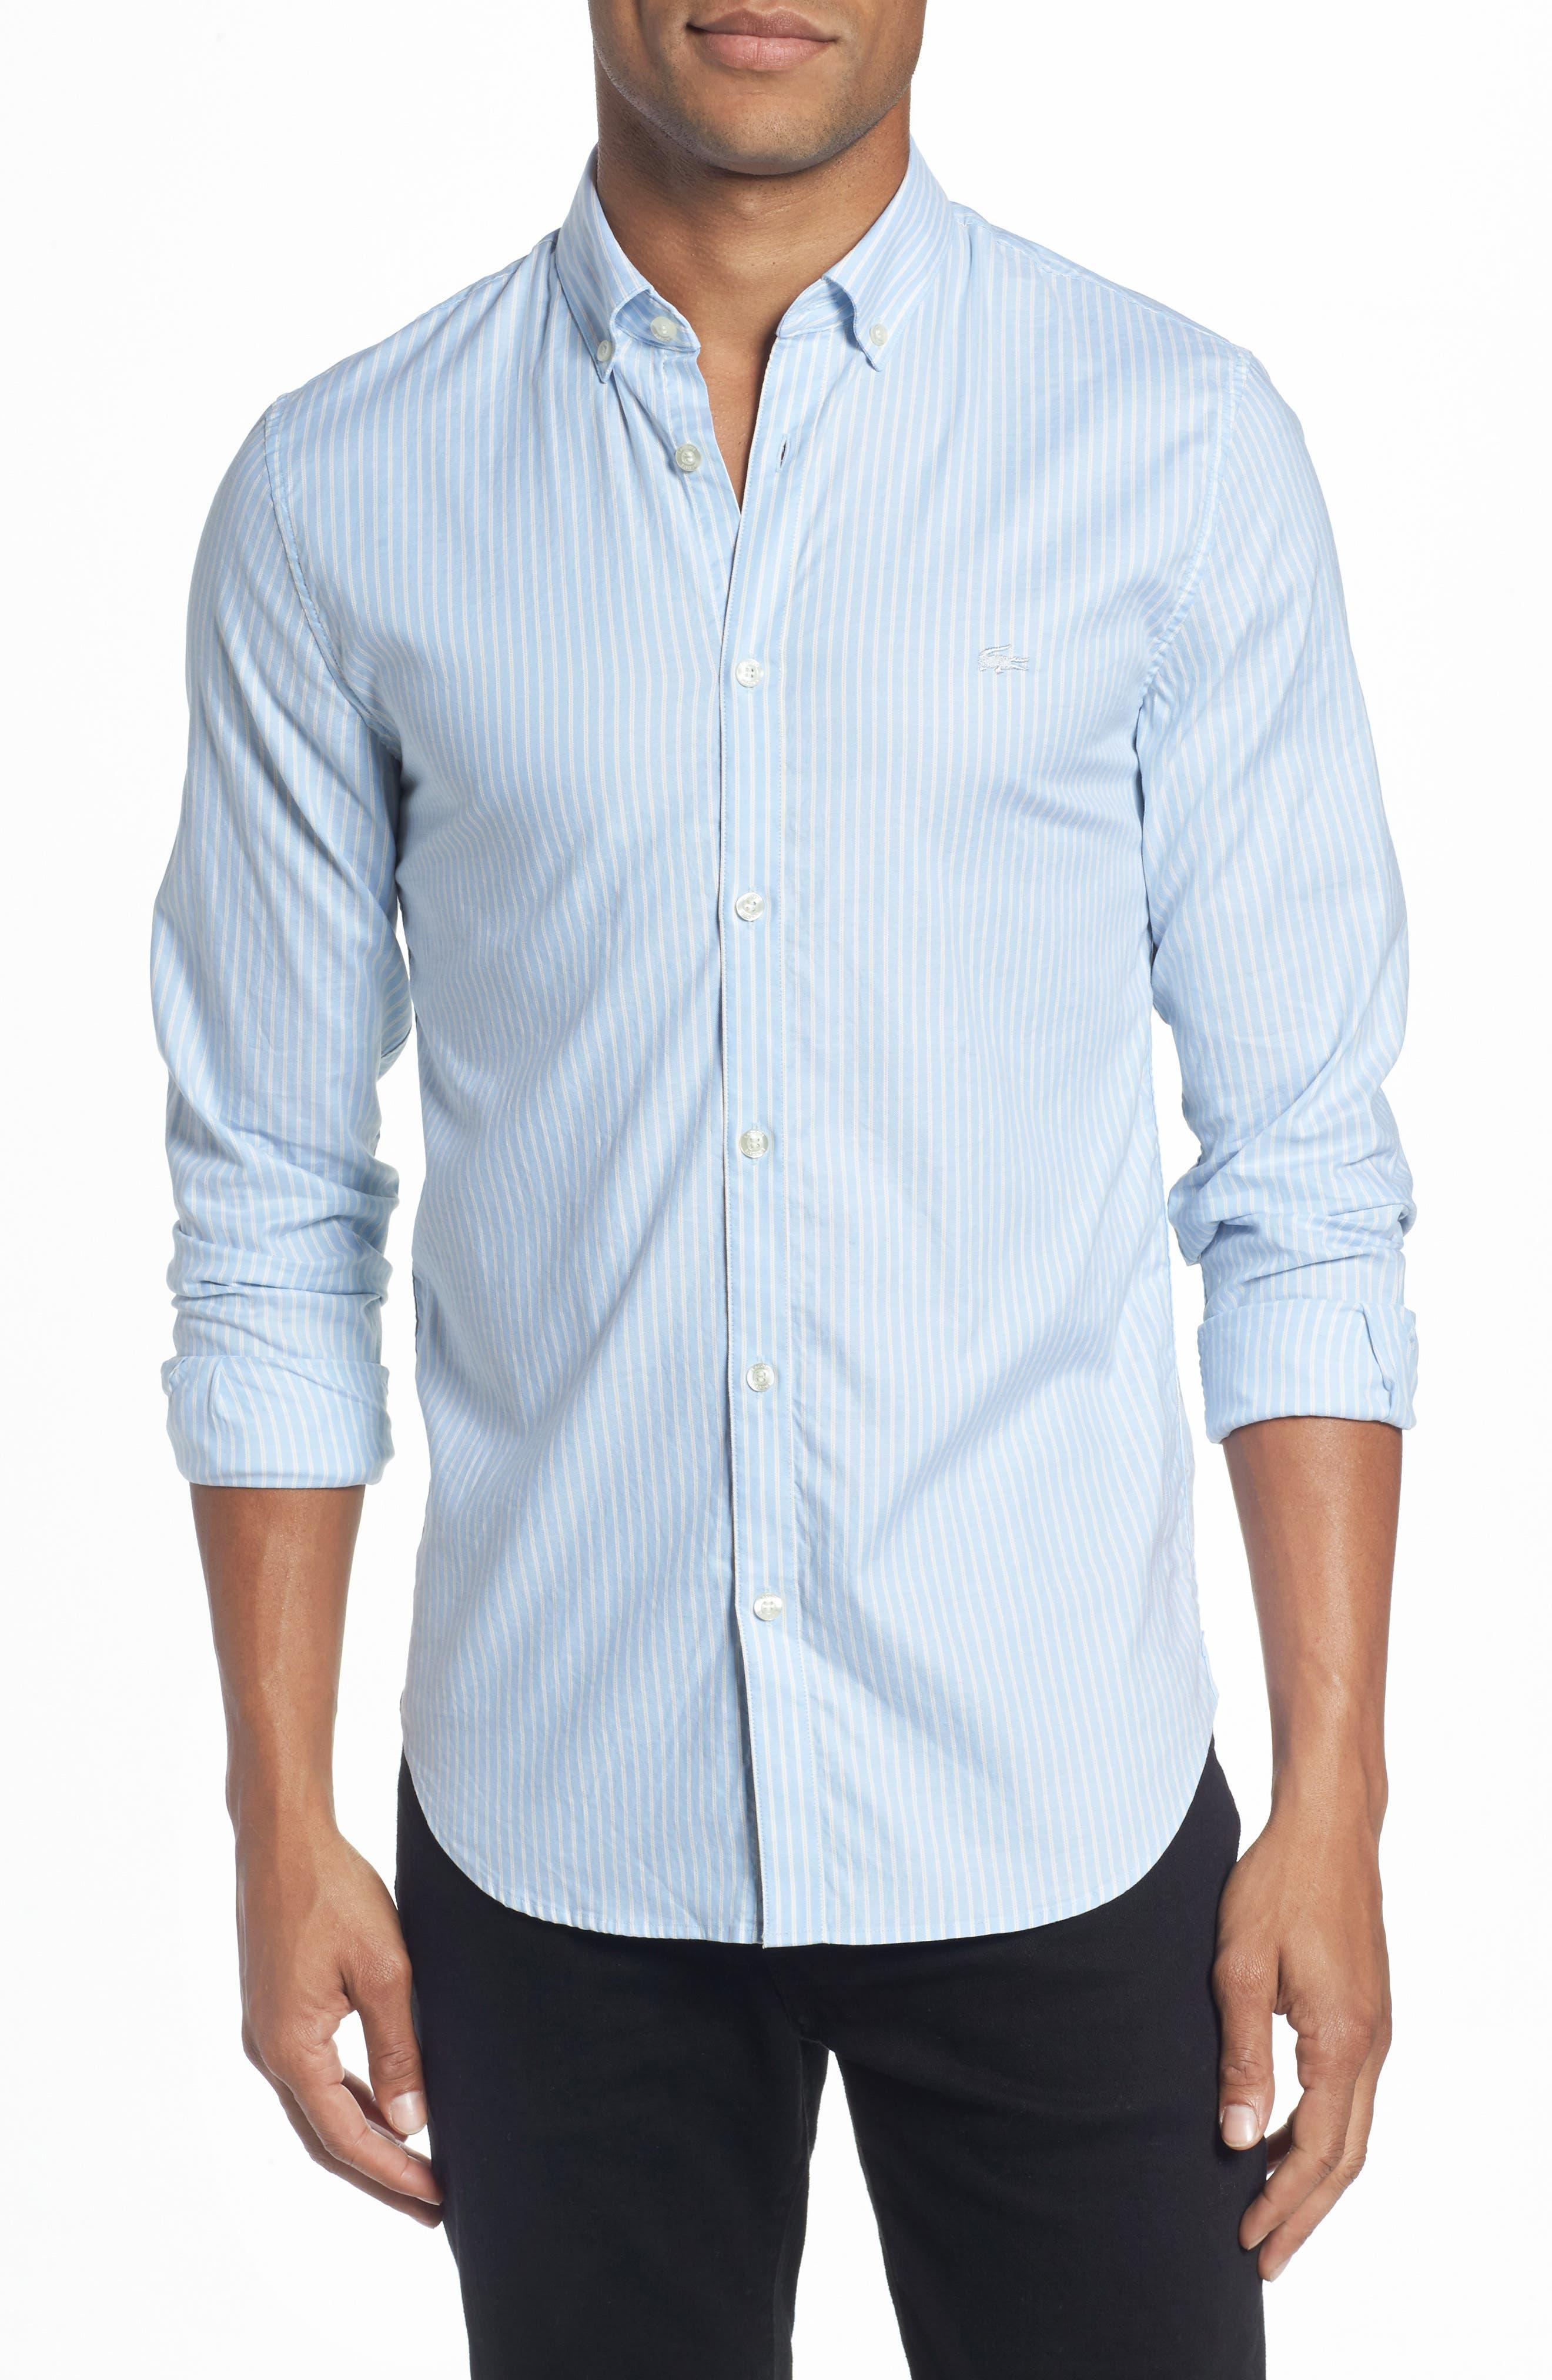 Main Image - Lacoste Slim Fit Stripe Shirt